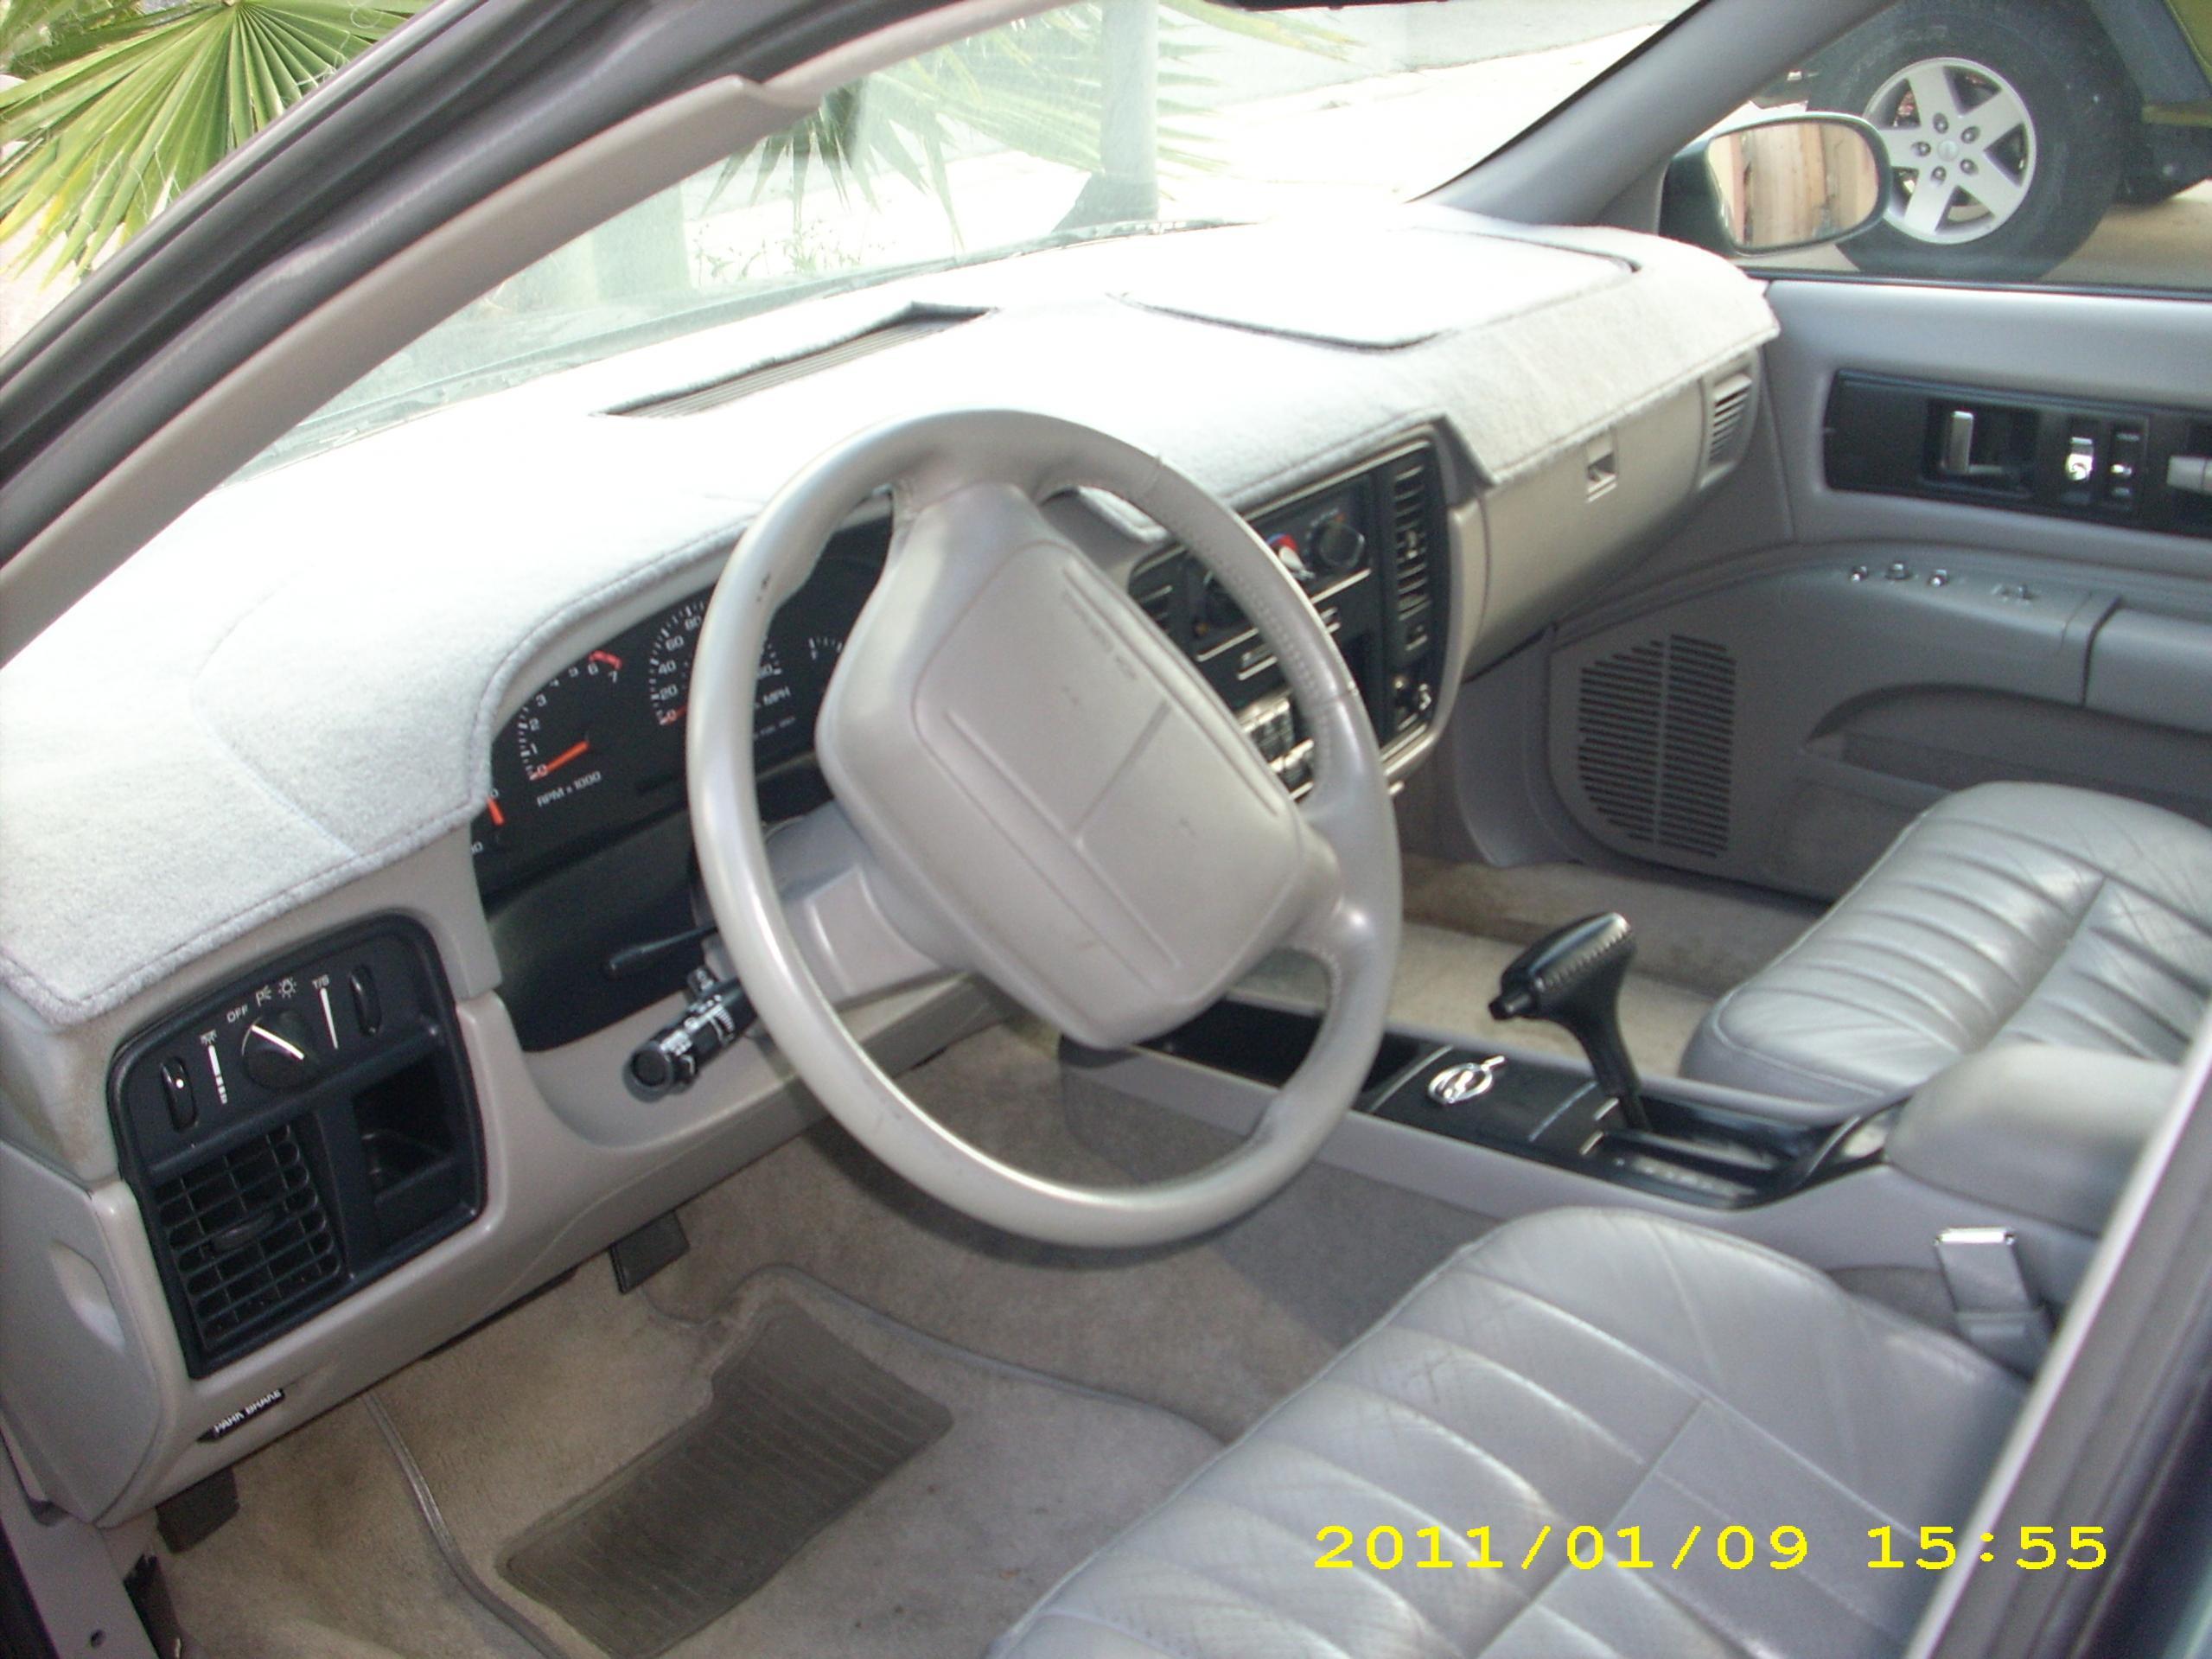 Low Mileage 1996 Impala SS for sale in San Diego-dsci0007.jpg